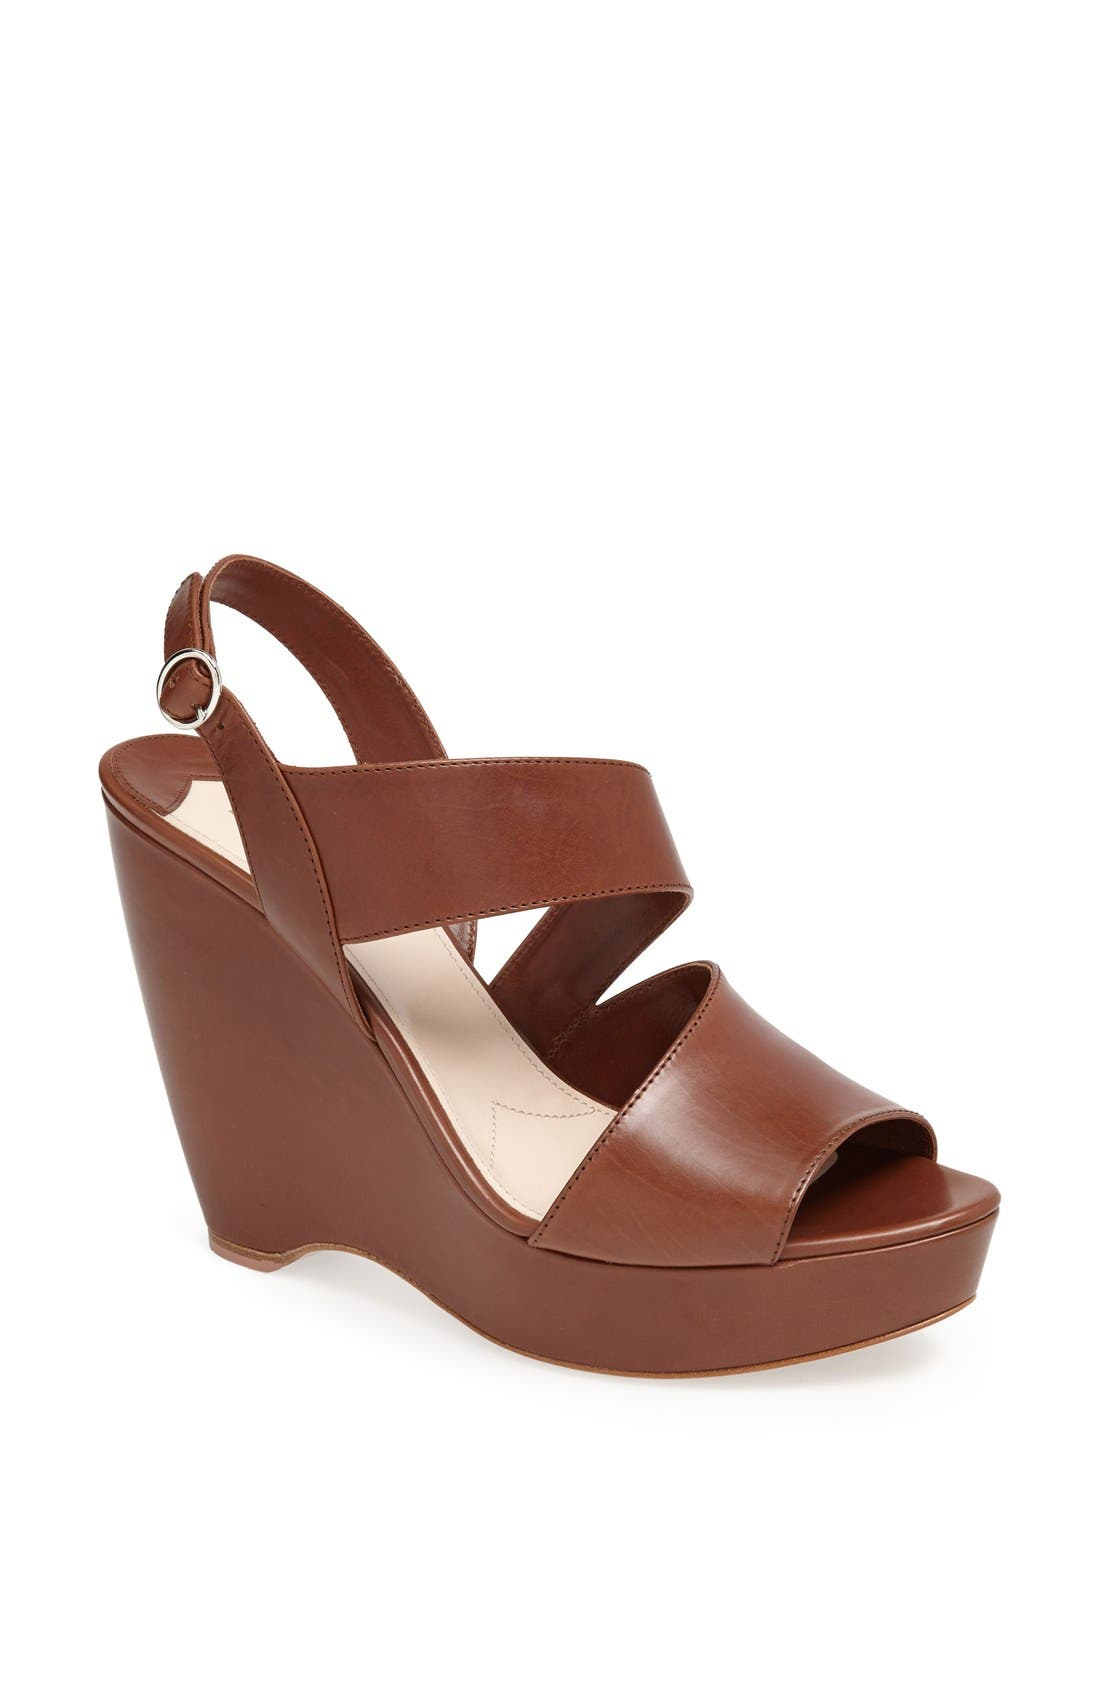 Alternate Image 1 Selected - Prada Asymmetrical Wedge Sandal